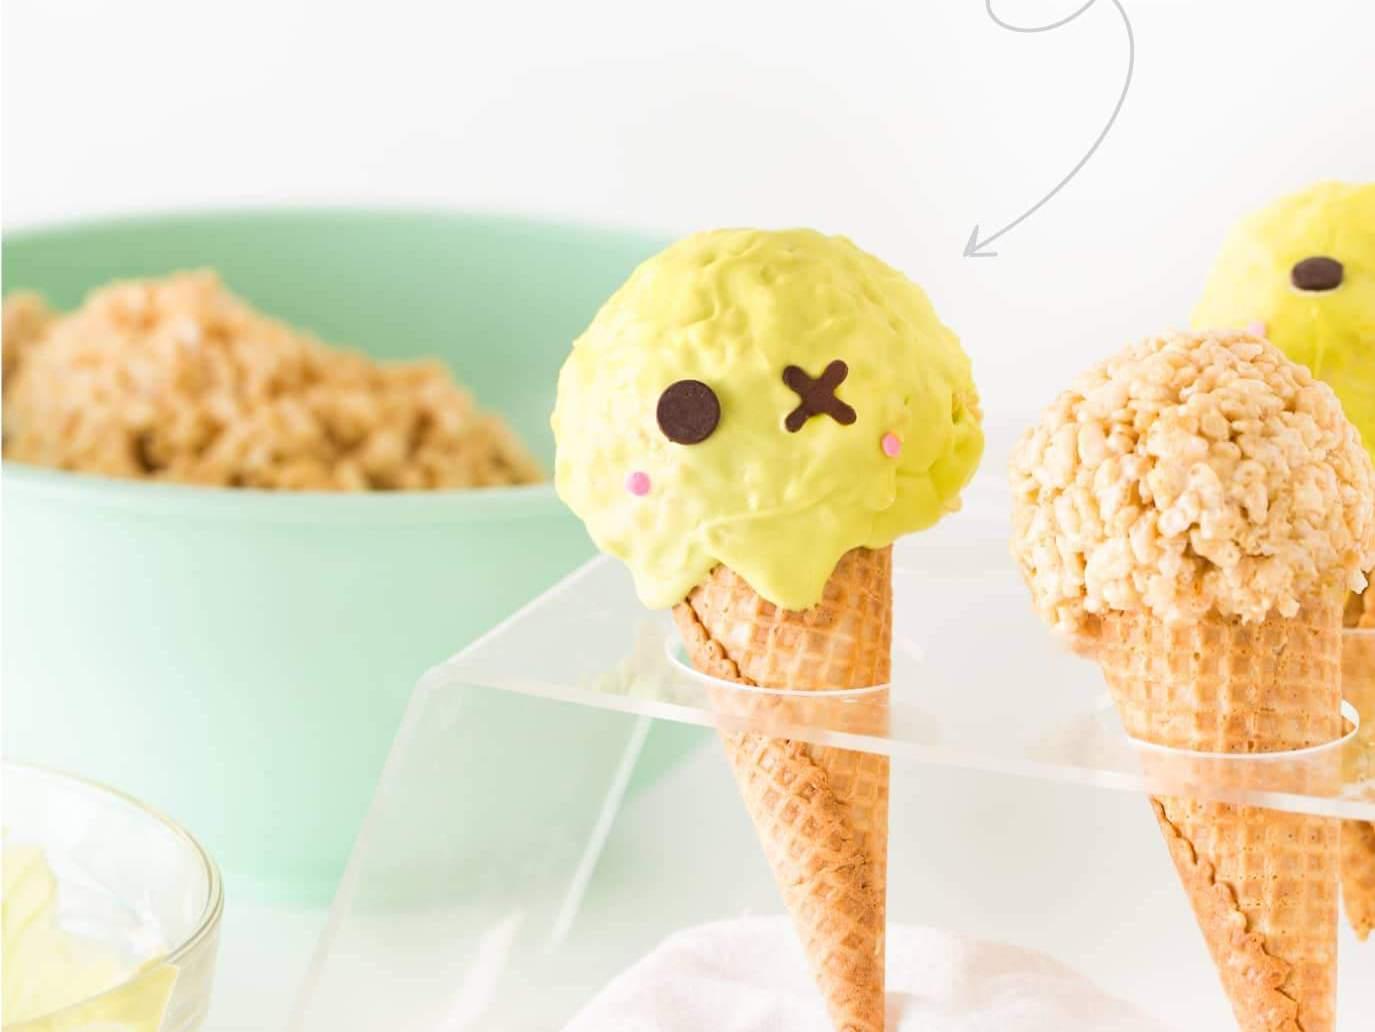 Cute Zombie Halloween Rice Krispie Treats in plastic ice cream cone holder.